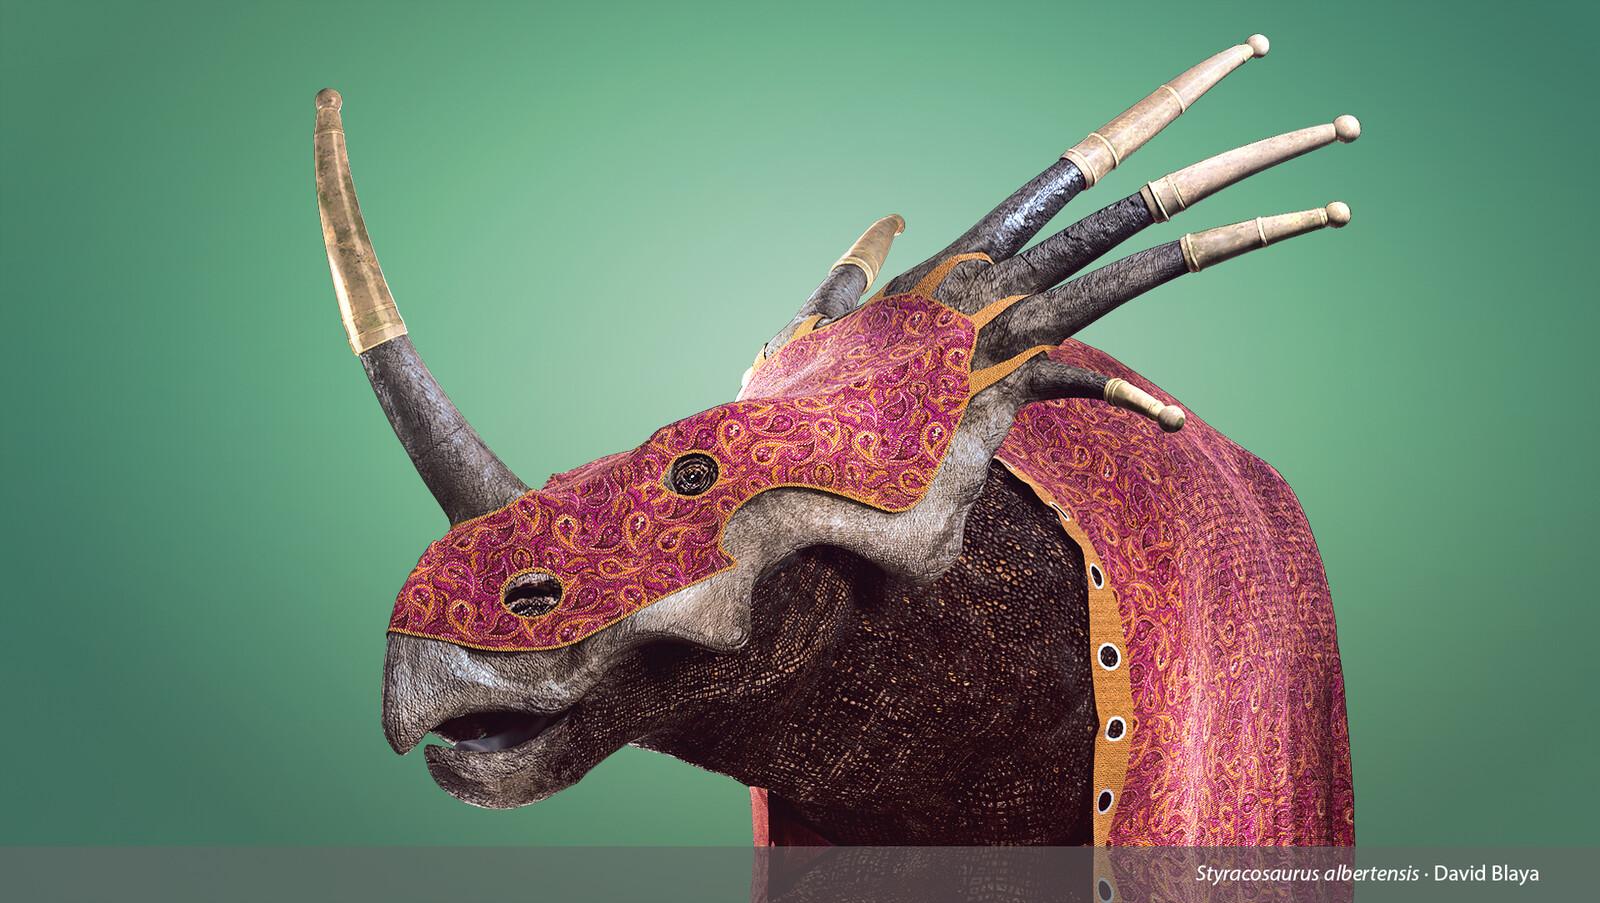 Styracosaurus albertensis - The spiked lizard